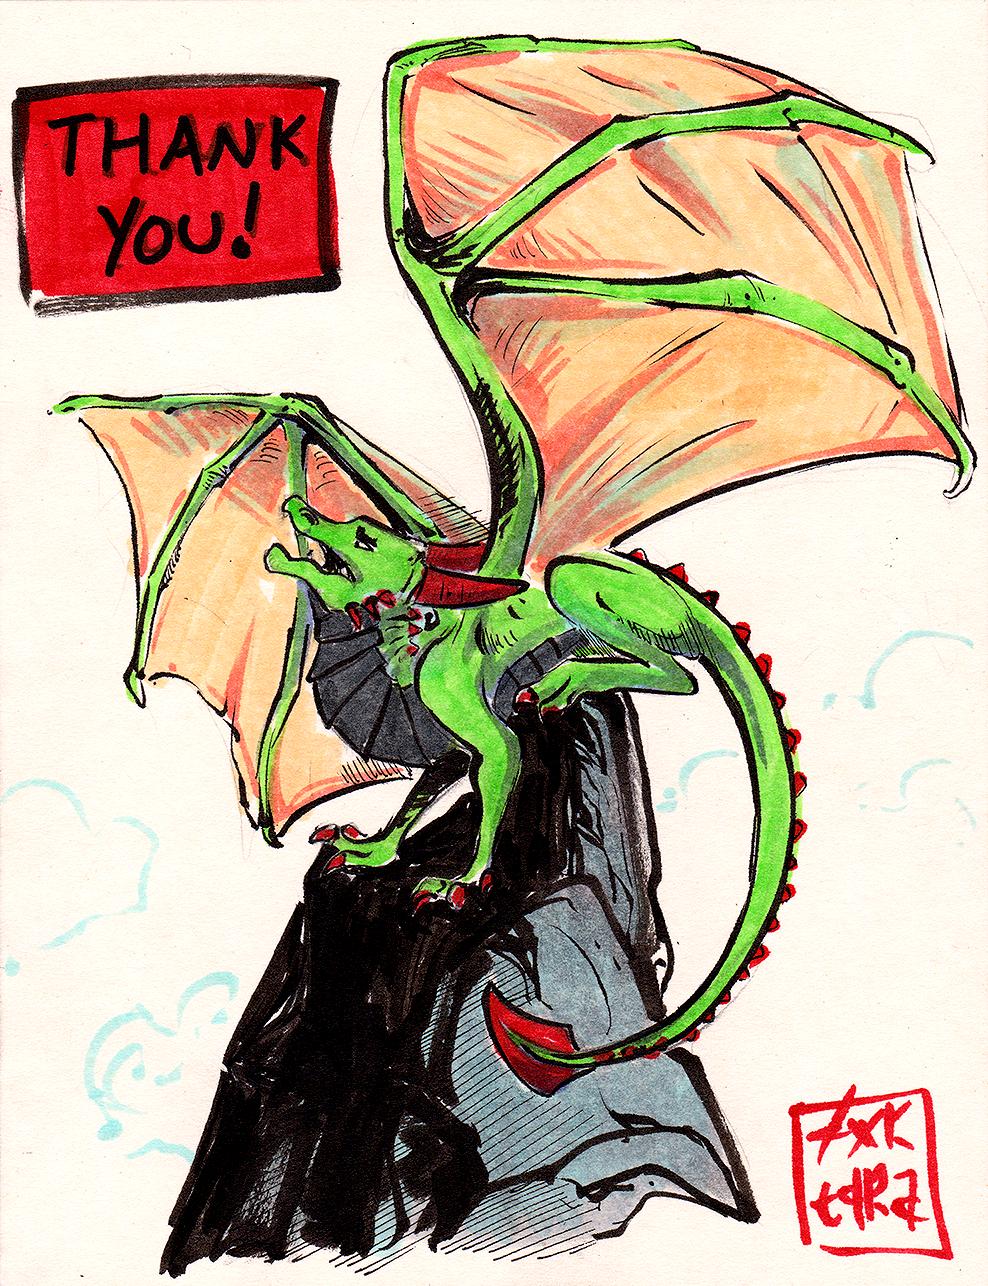 Vengeful Sketch by Ahkward